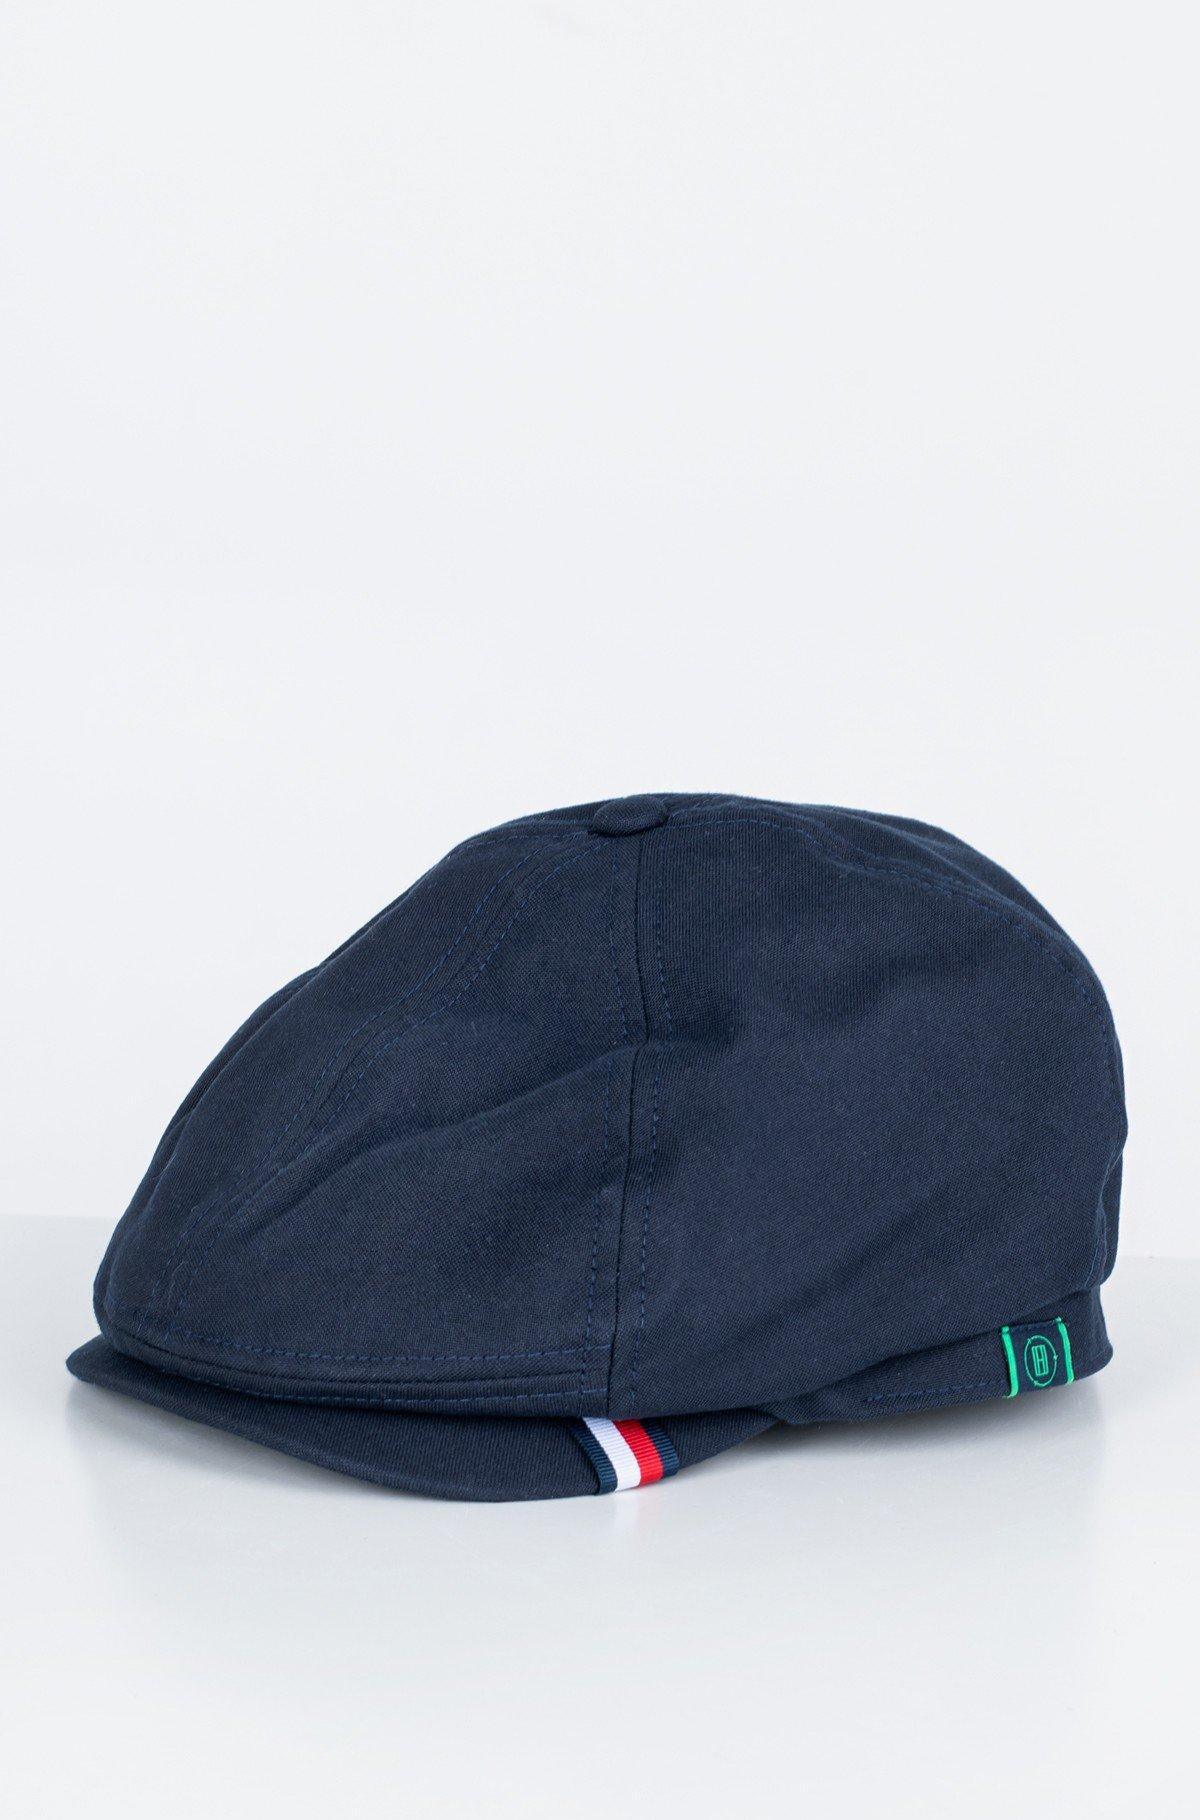 Tvido kepurė RECYCLED WOVEN FLAT CAP-full-2